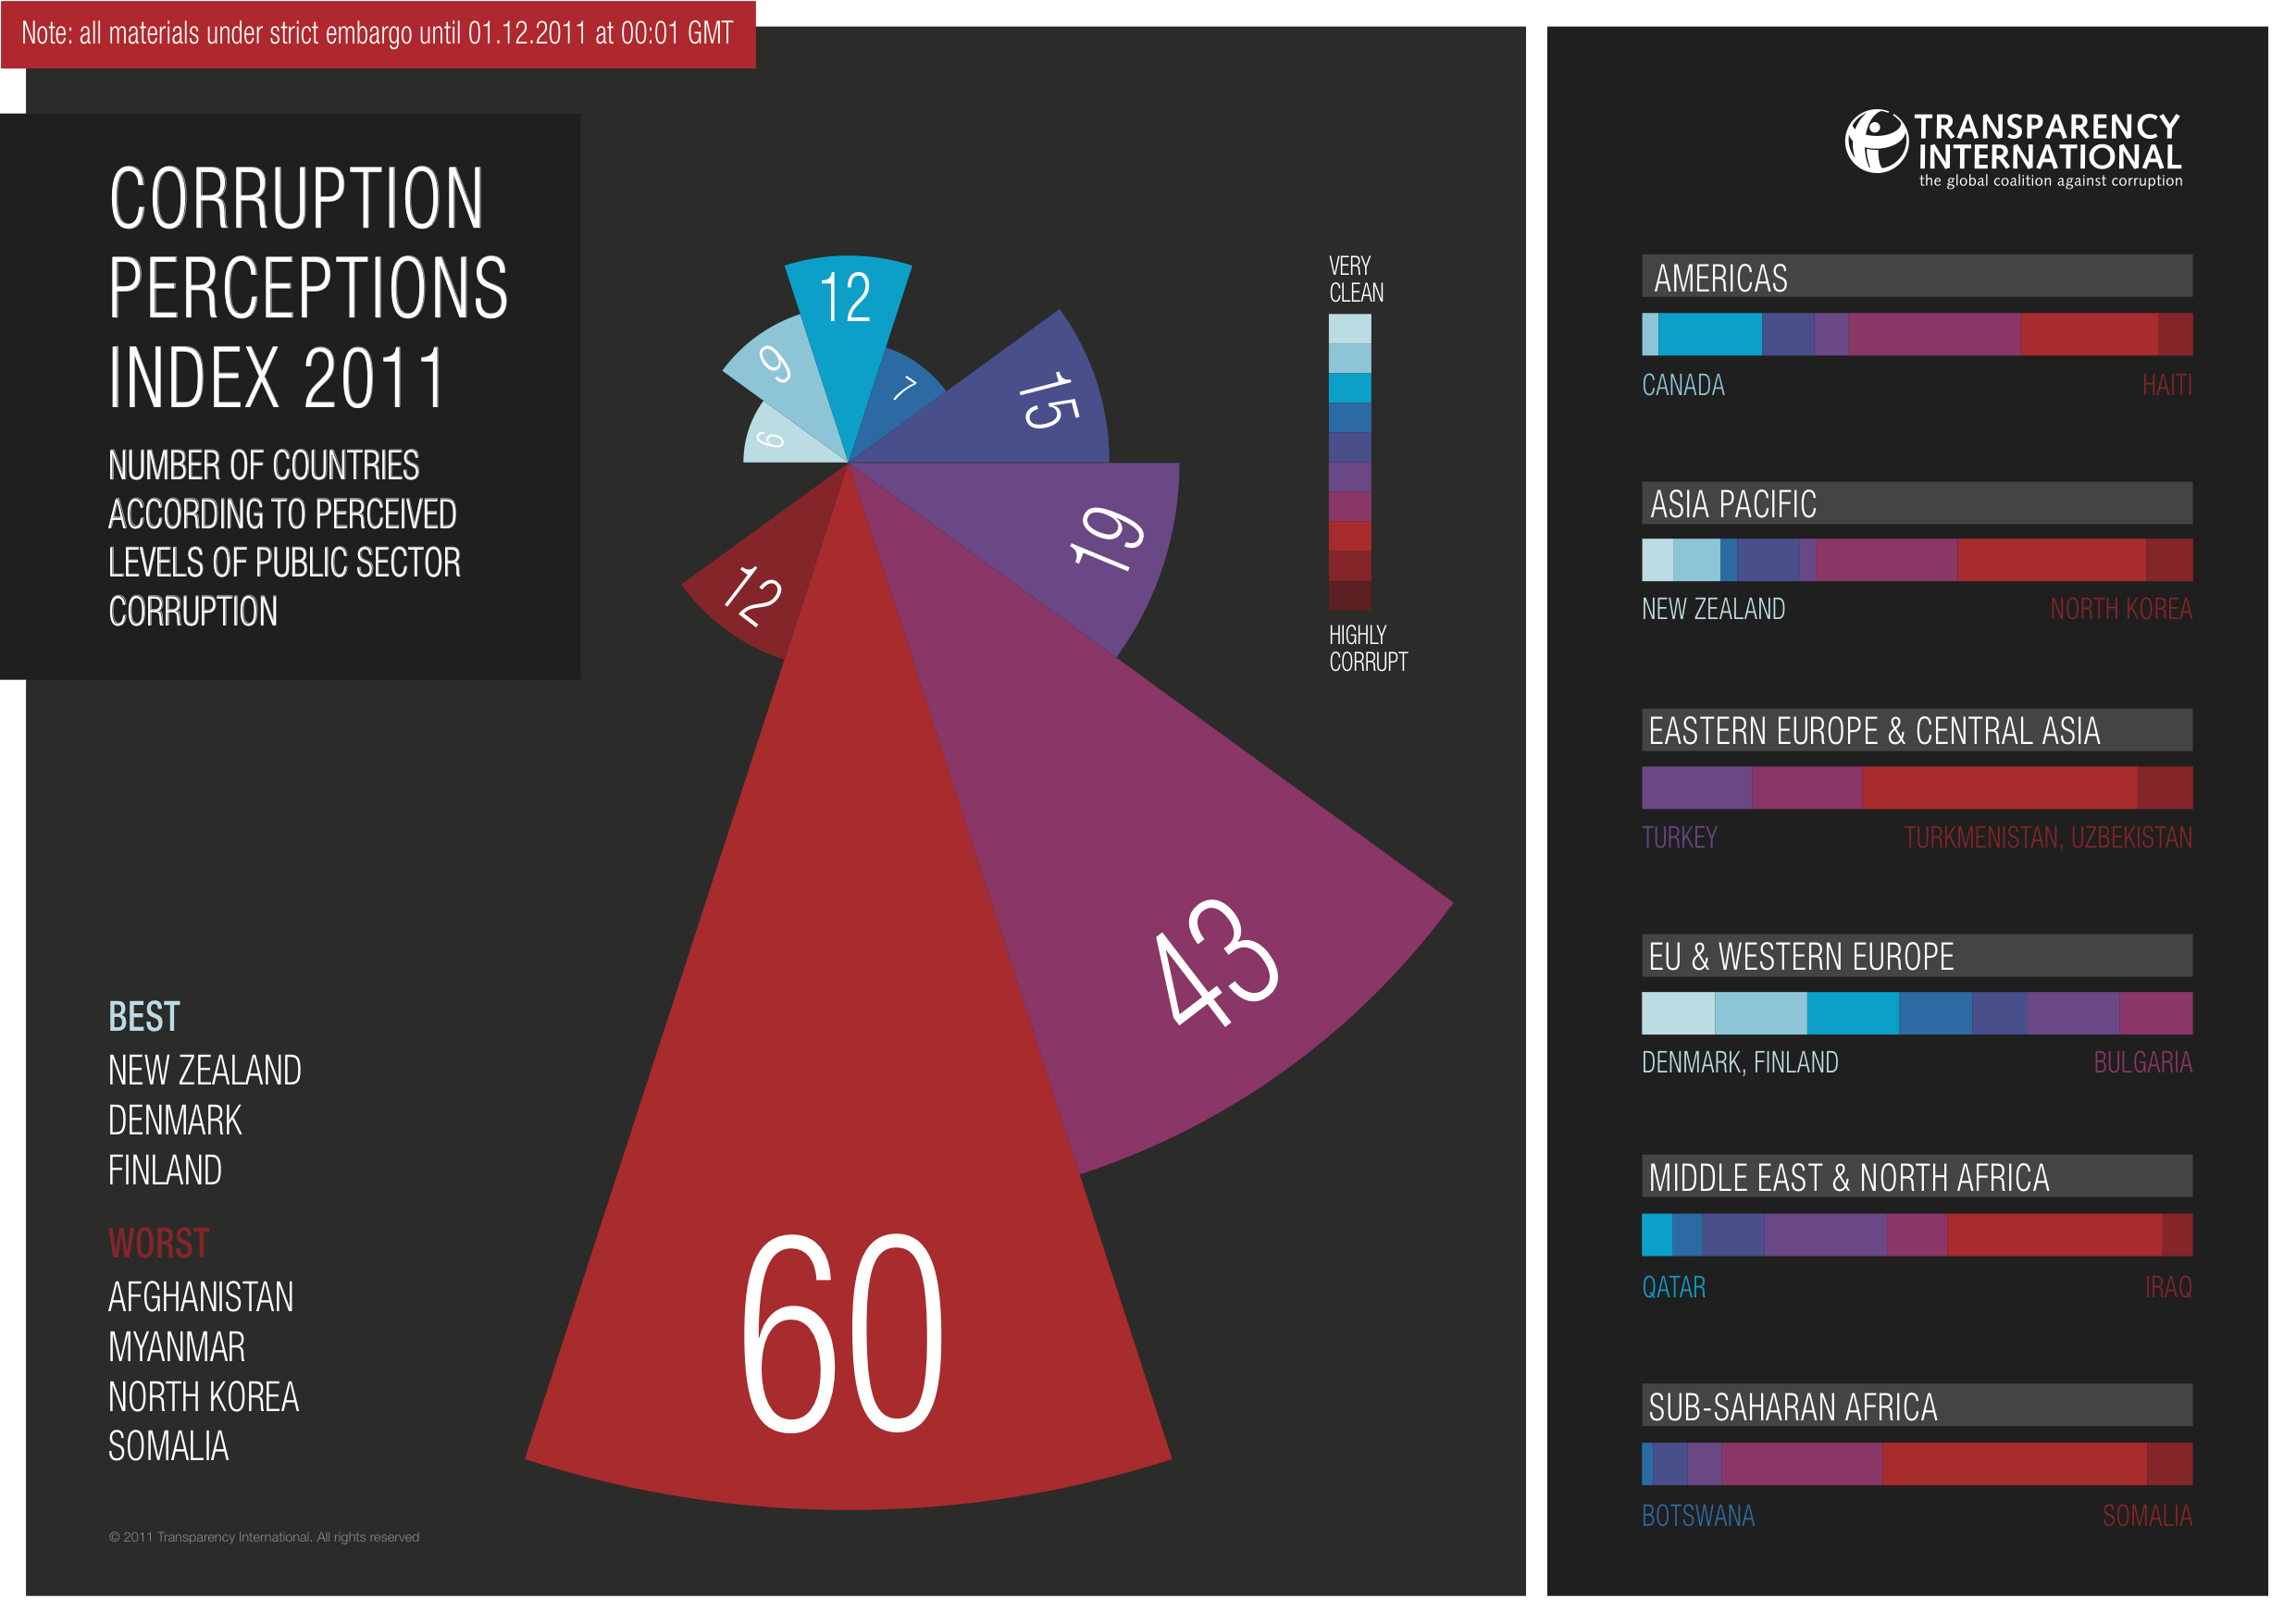 Corruption Perceptions Index 2011